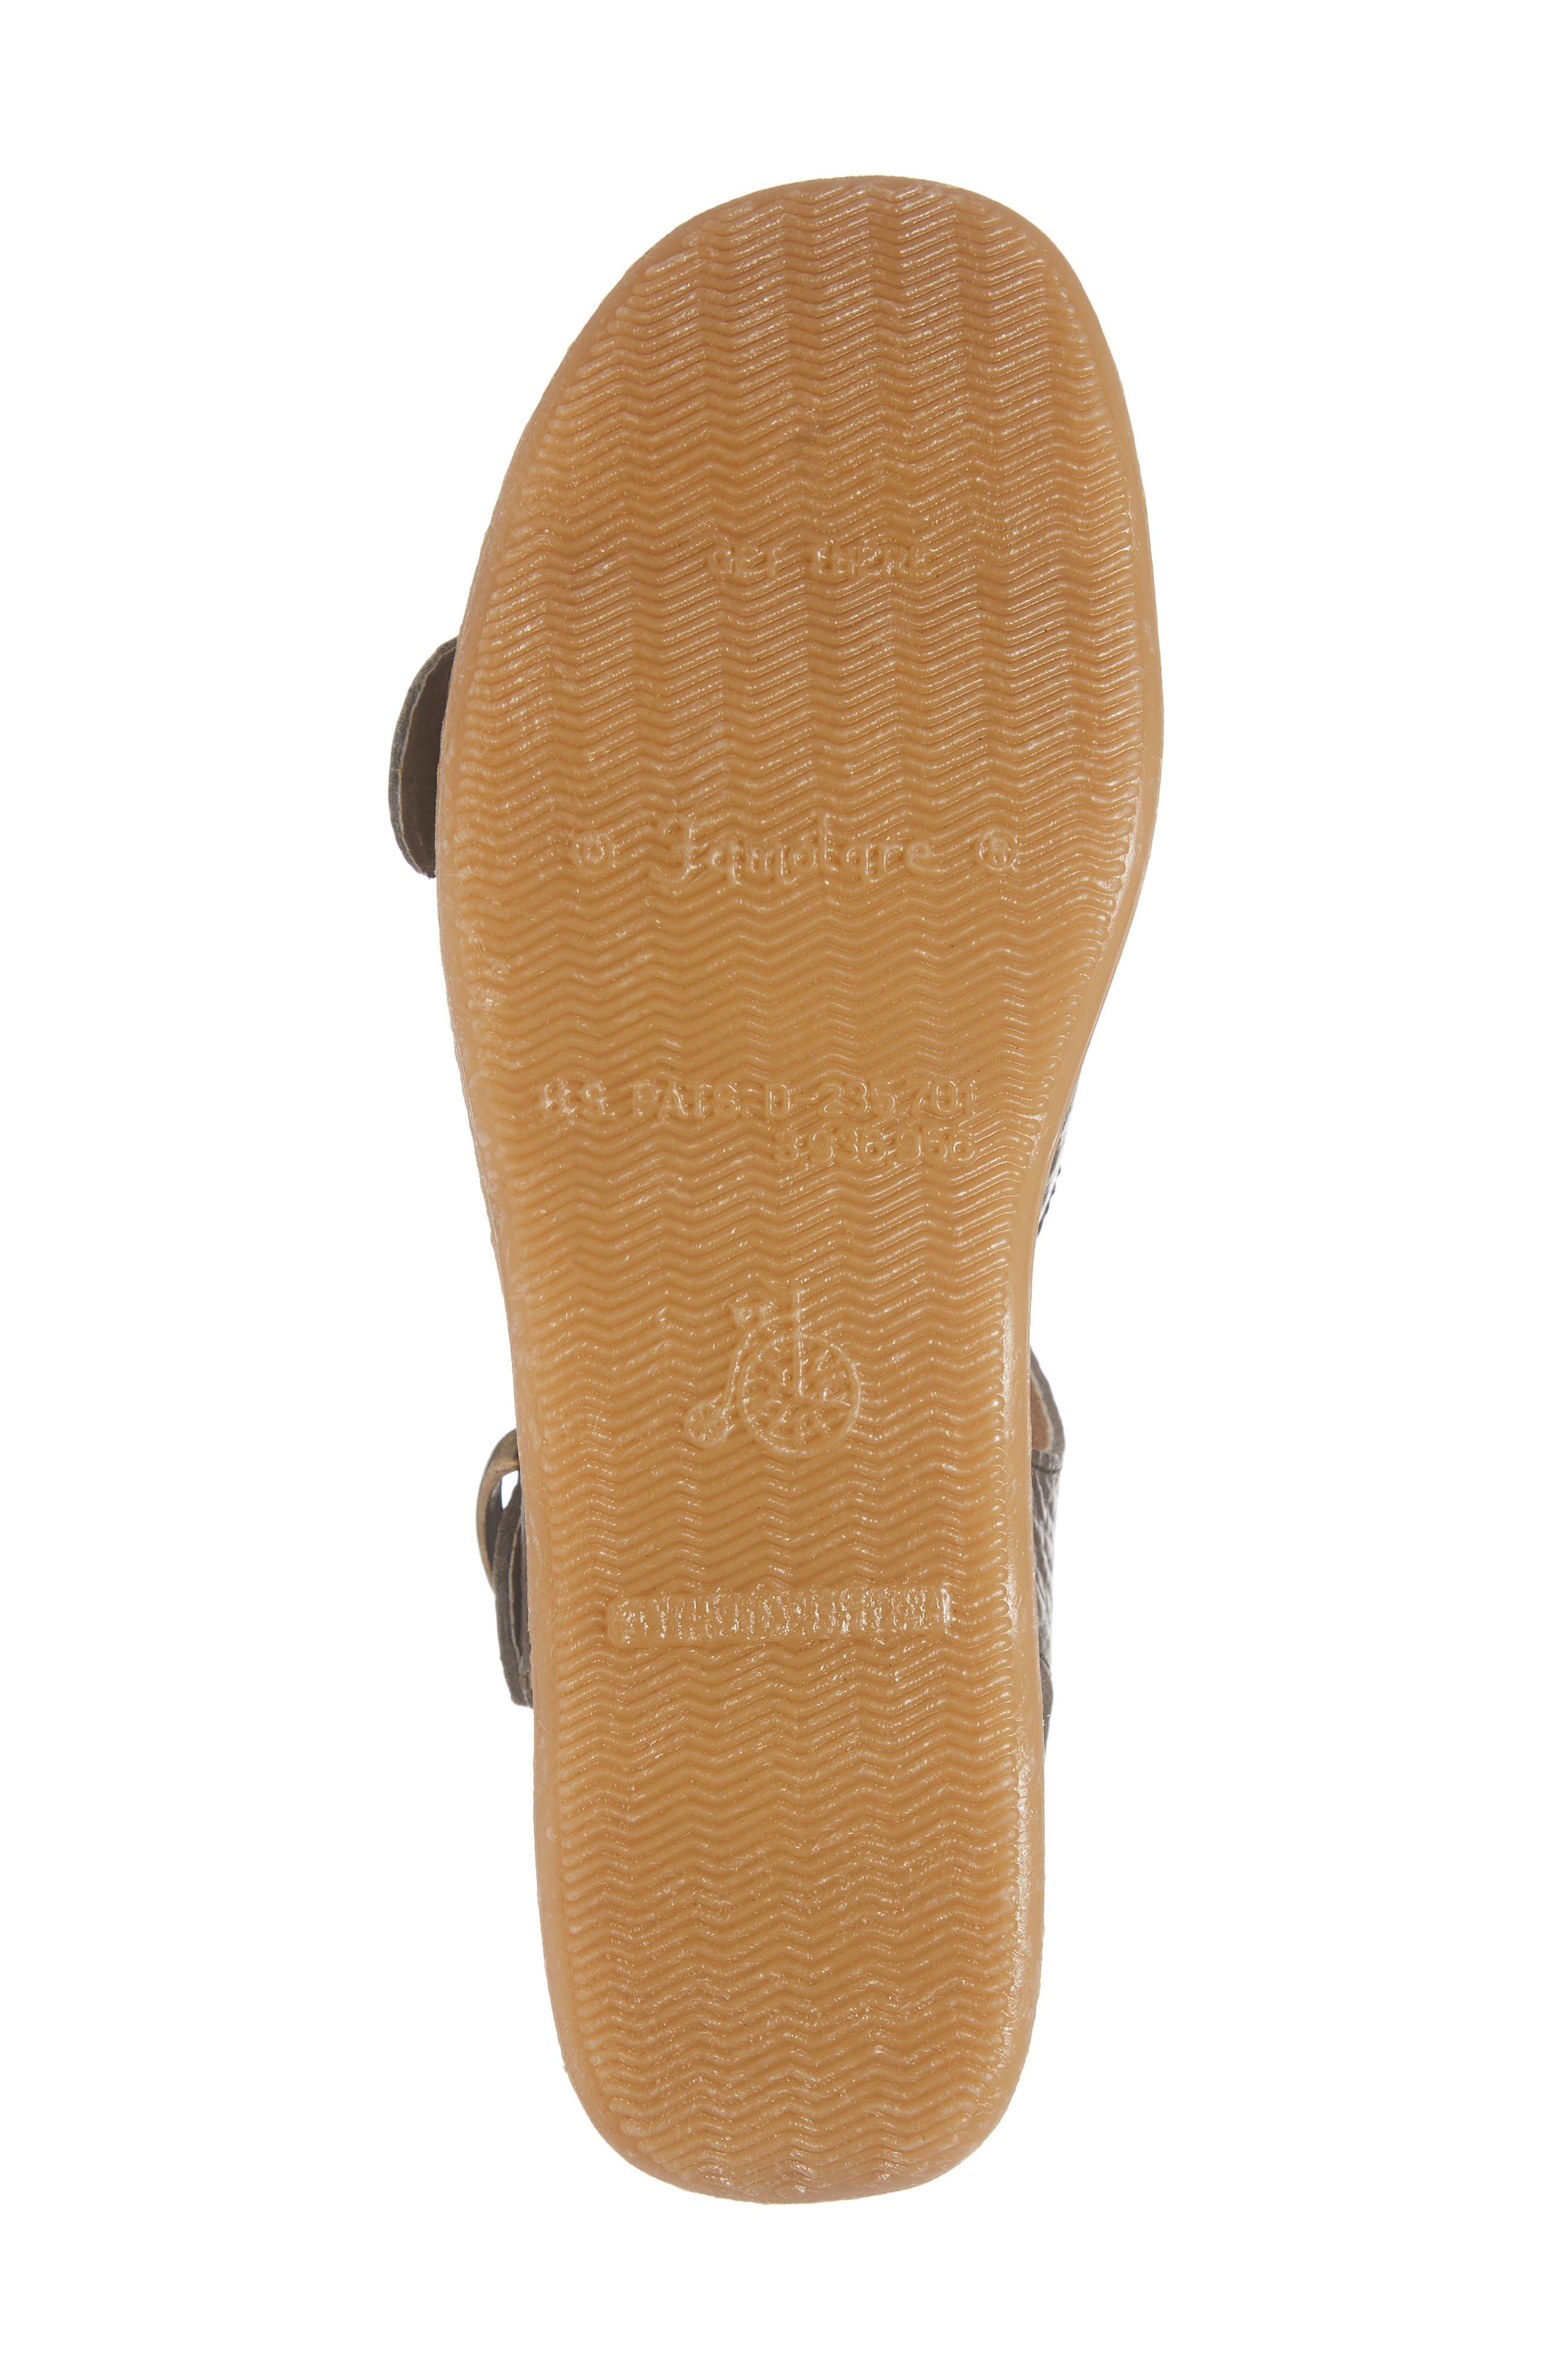 Double Play Platform Sandal,                             Alternate thumbnail 6, color,                             STEEL SUEDE